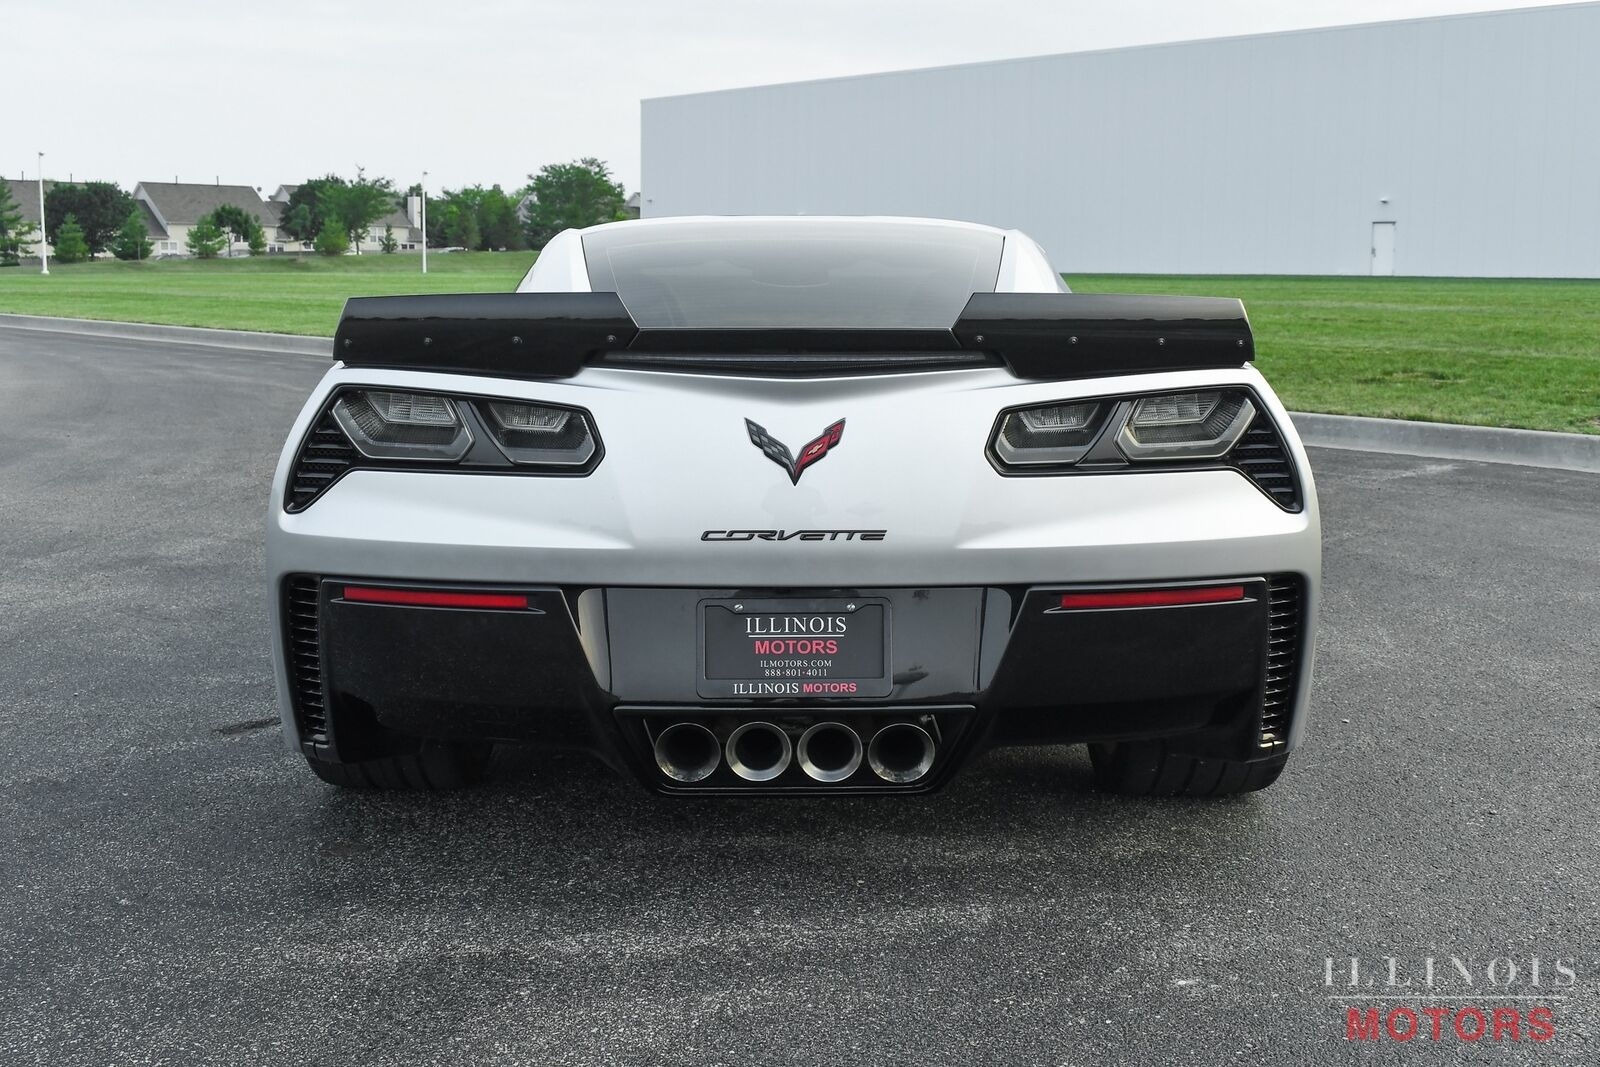 2015 Silver Chevrolet Corvette Z06  | C7 Corvette Photo 5